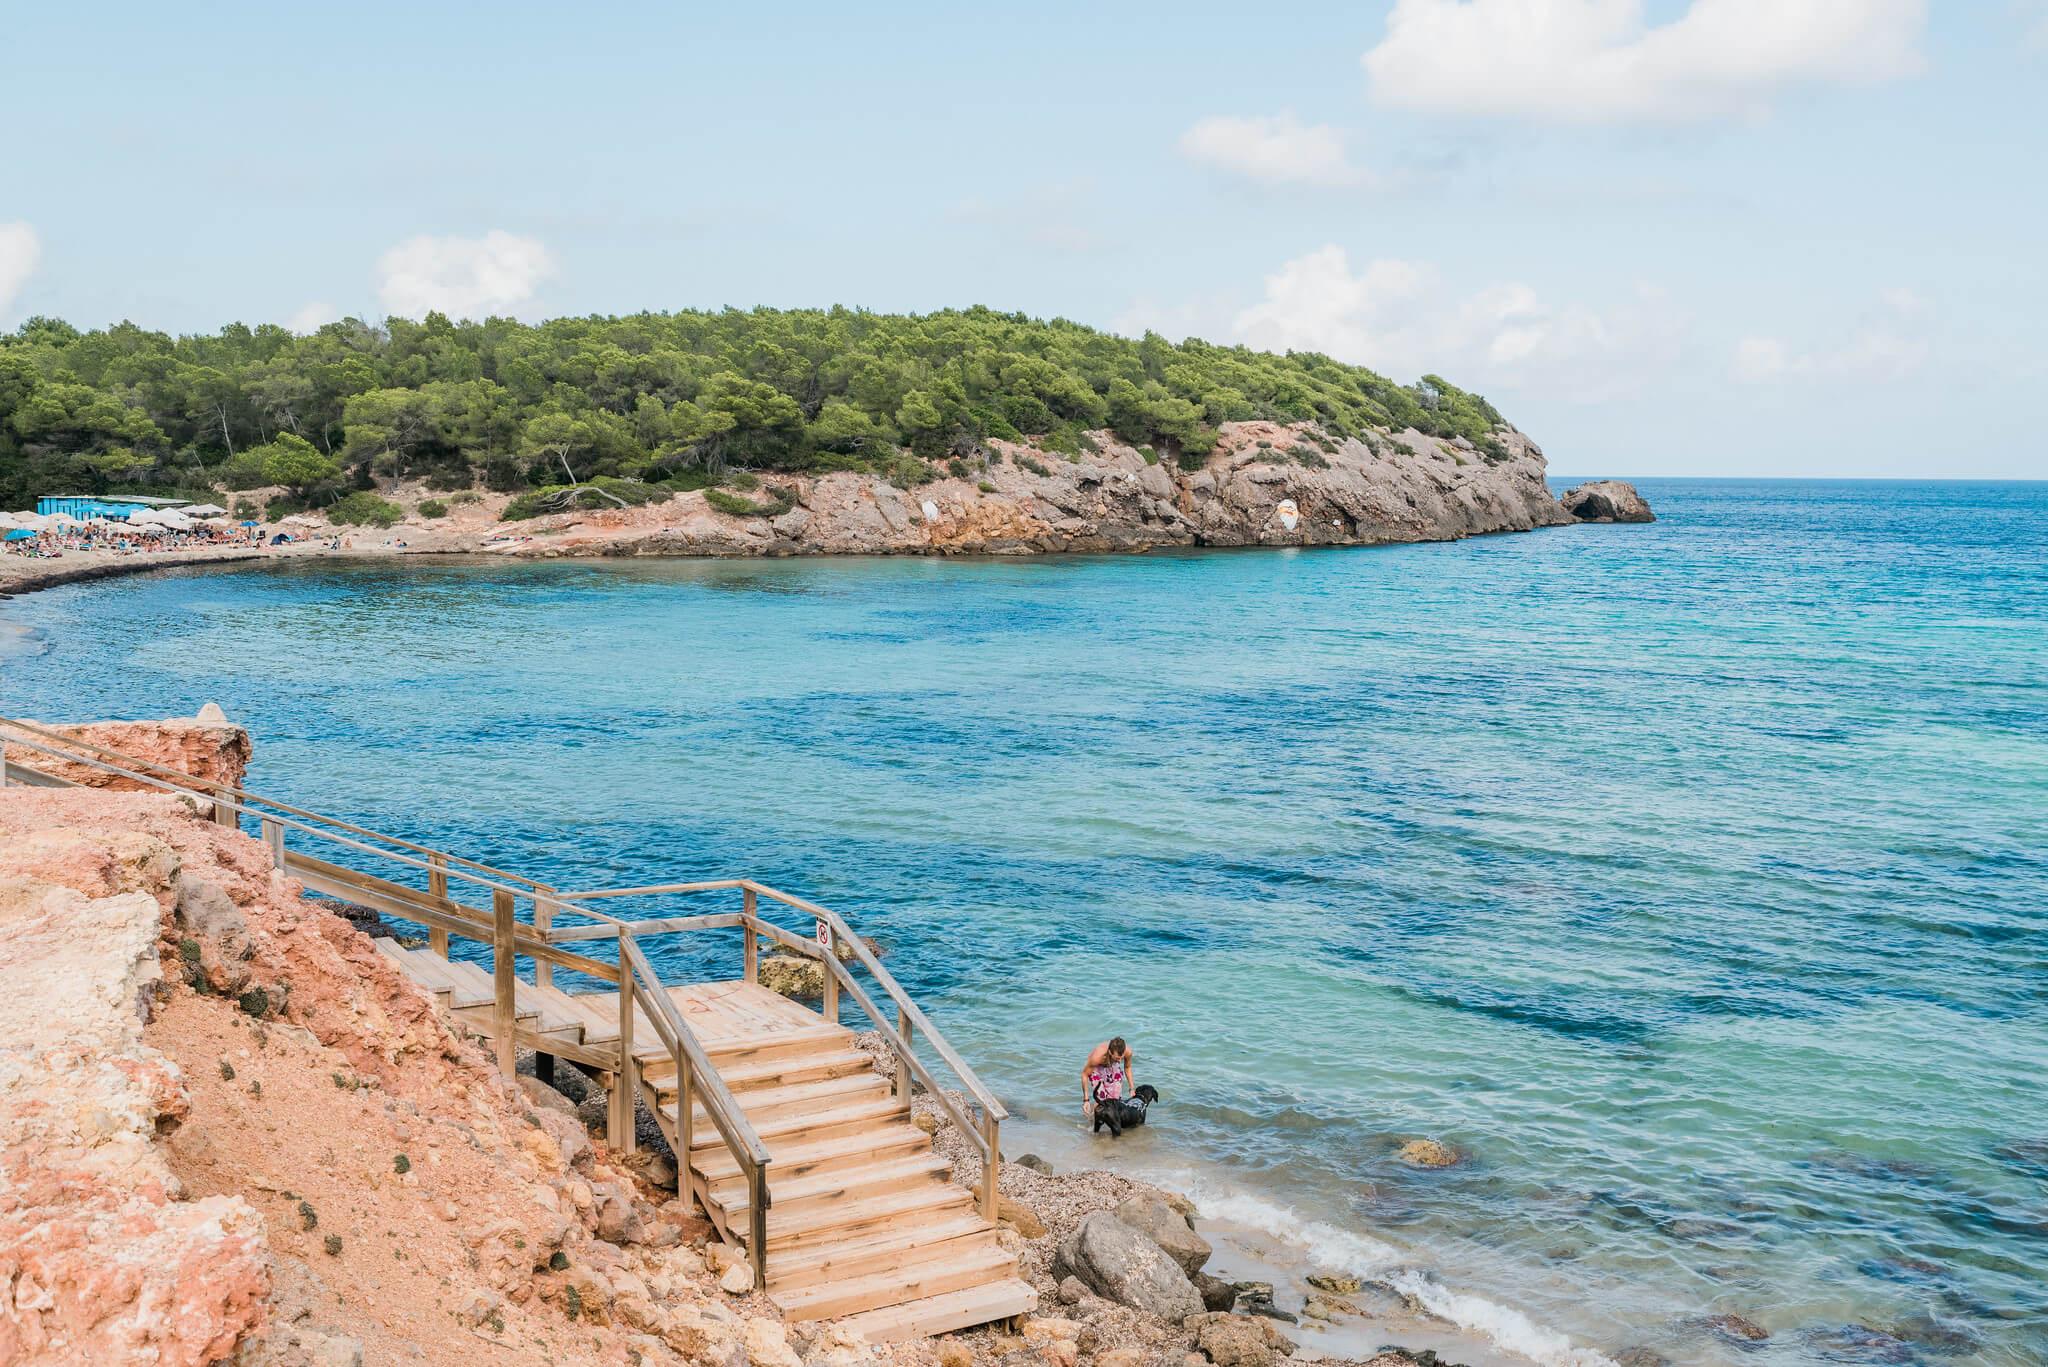 https://www.white-ibiza.com/wp-content/uploads/2020/03/ibiza-beaches-cala-nova-07.jpg